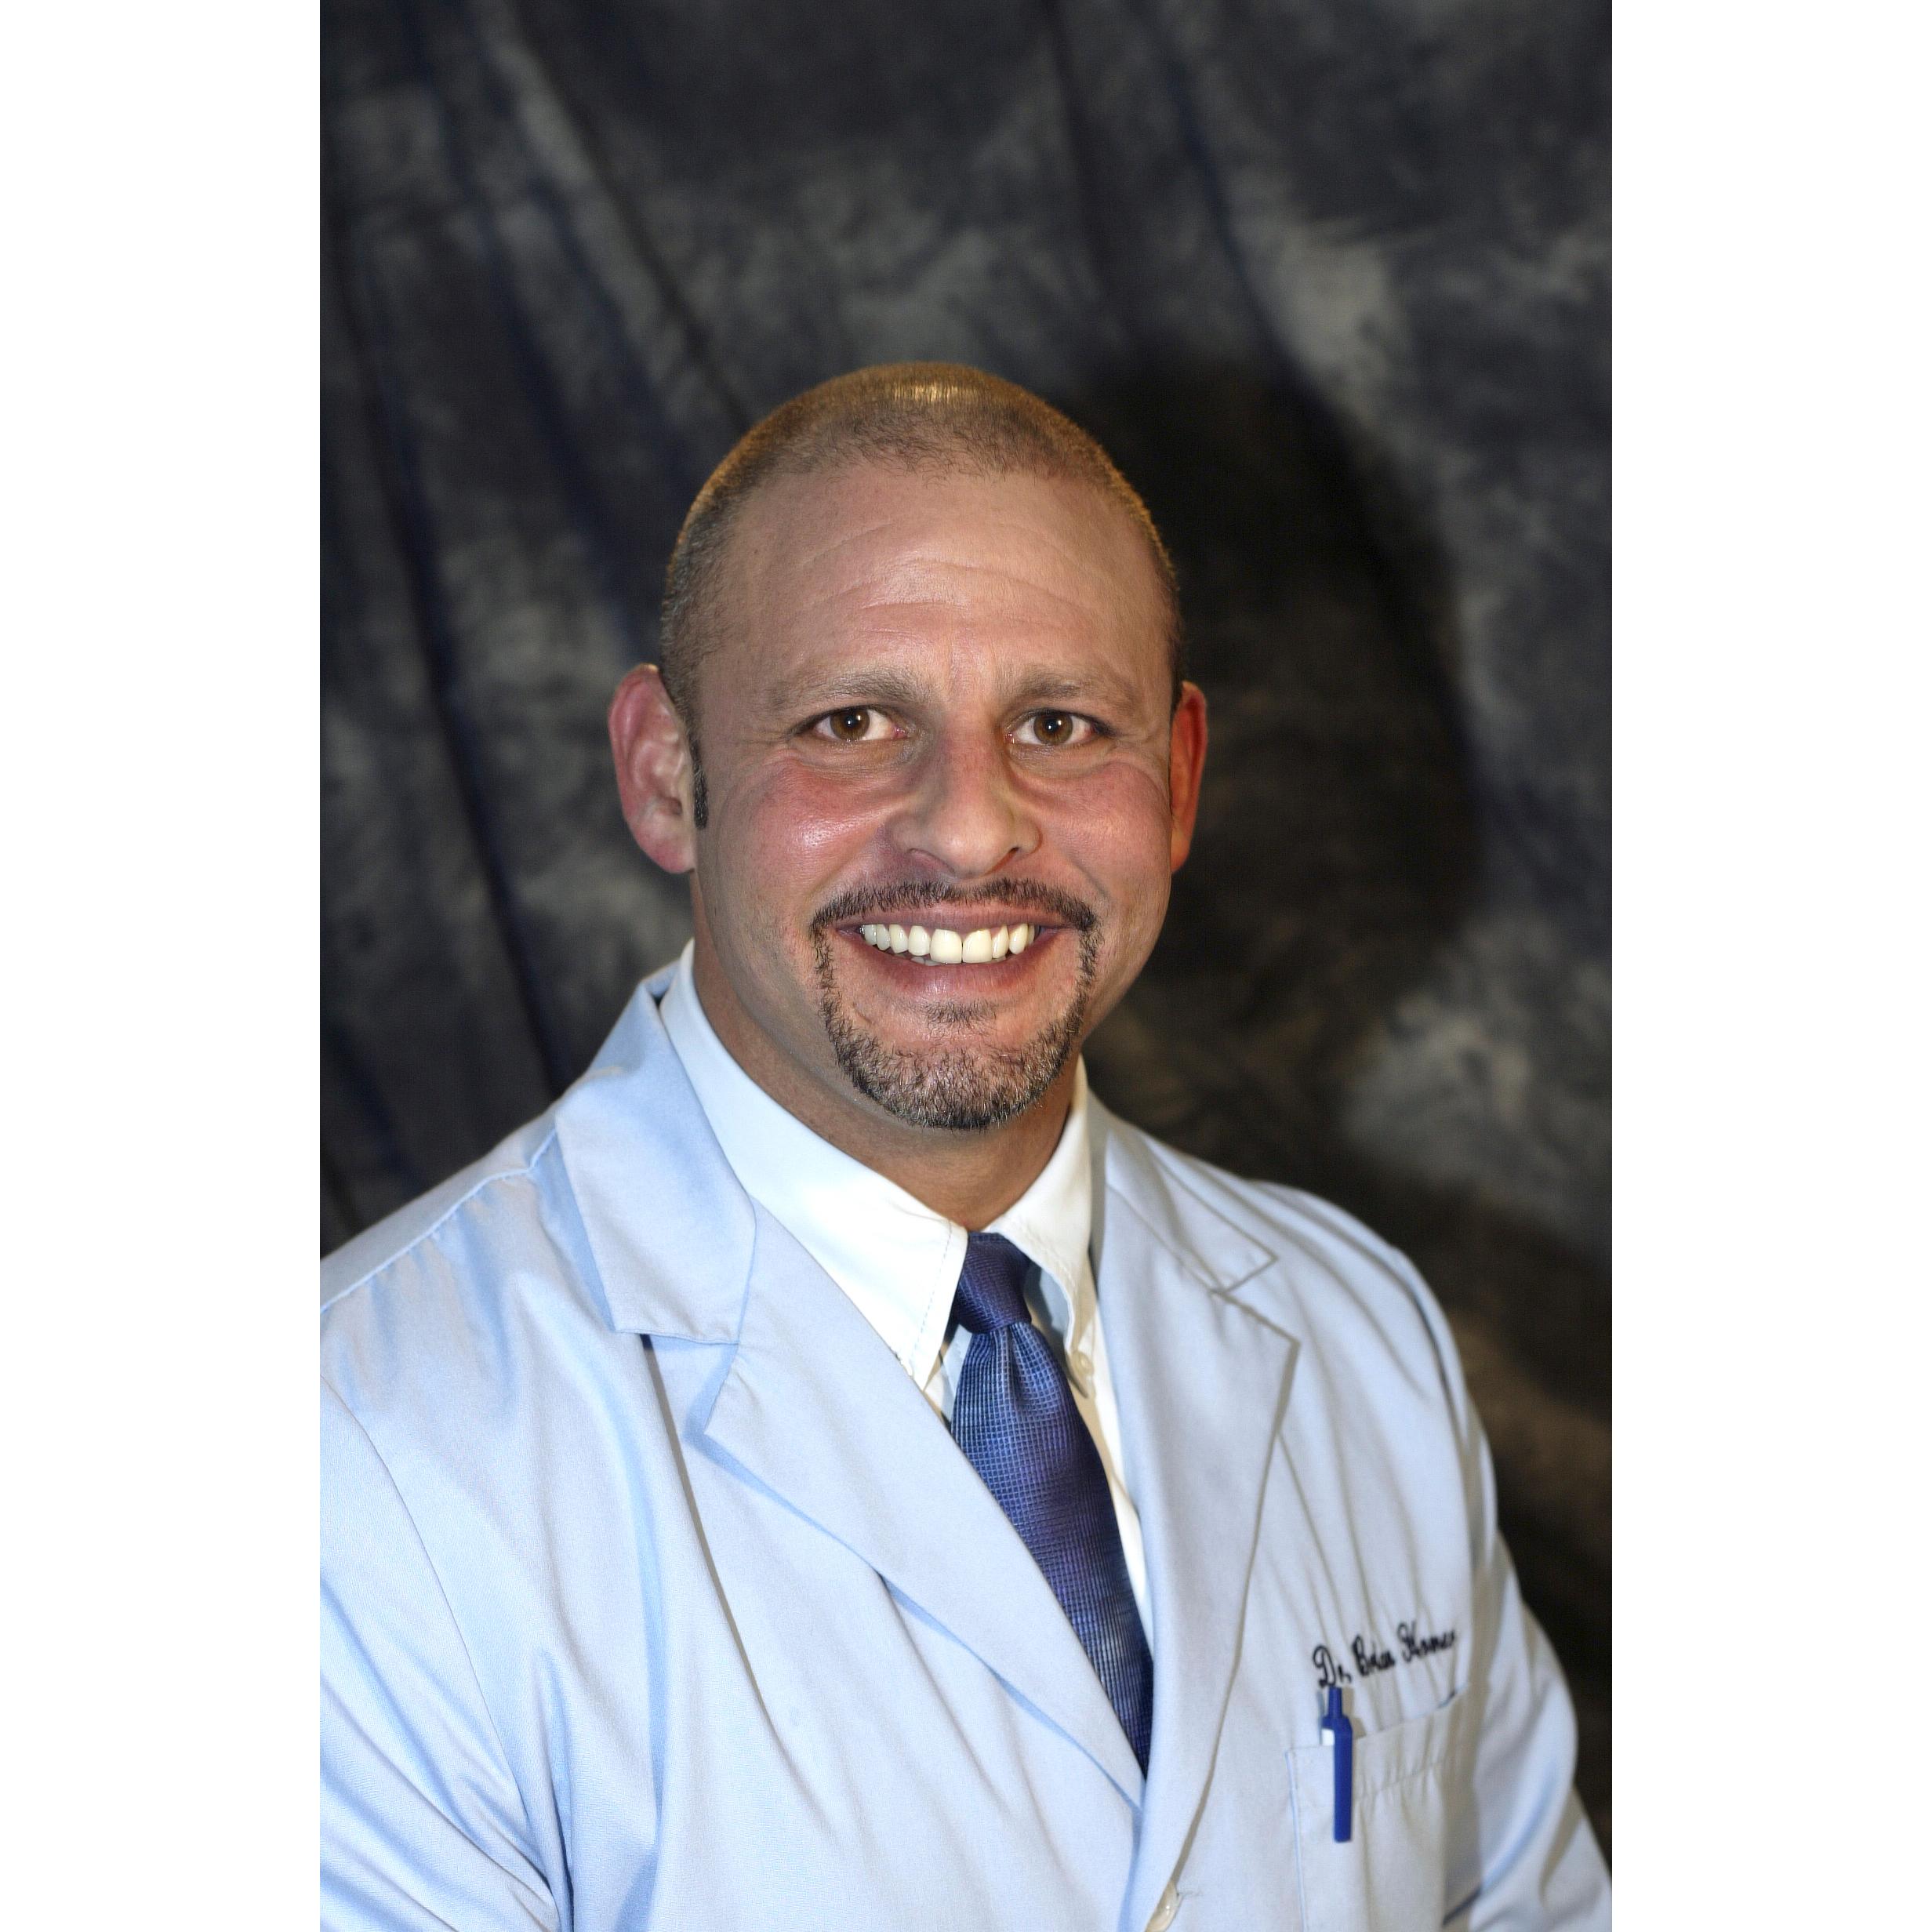 Dr. Brian Homer